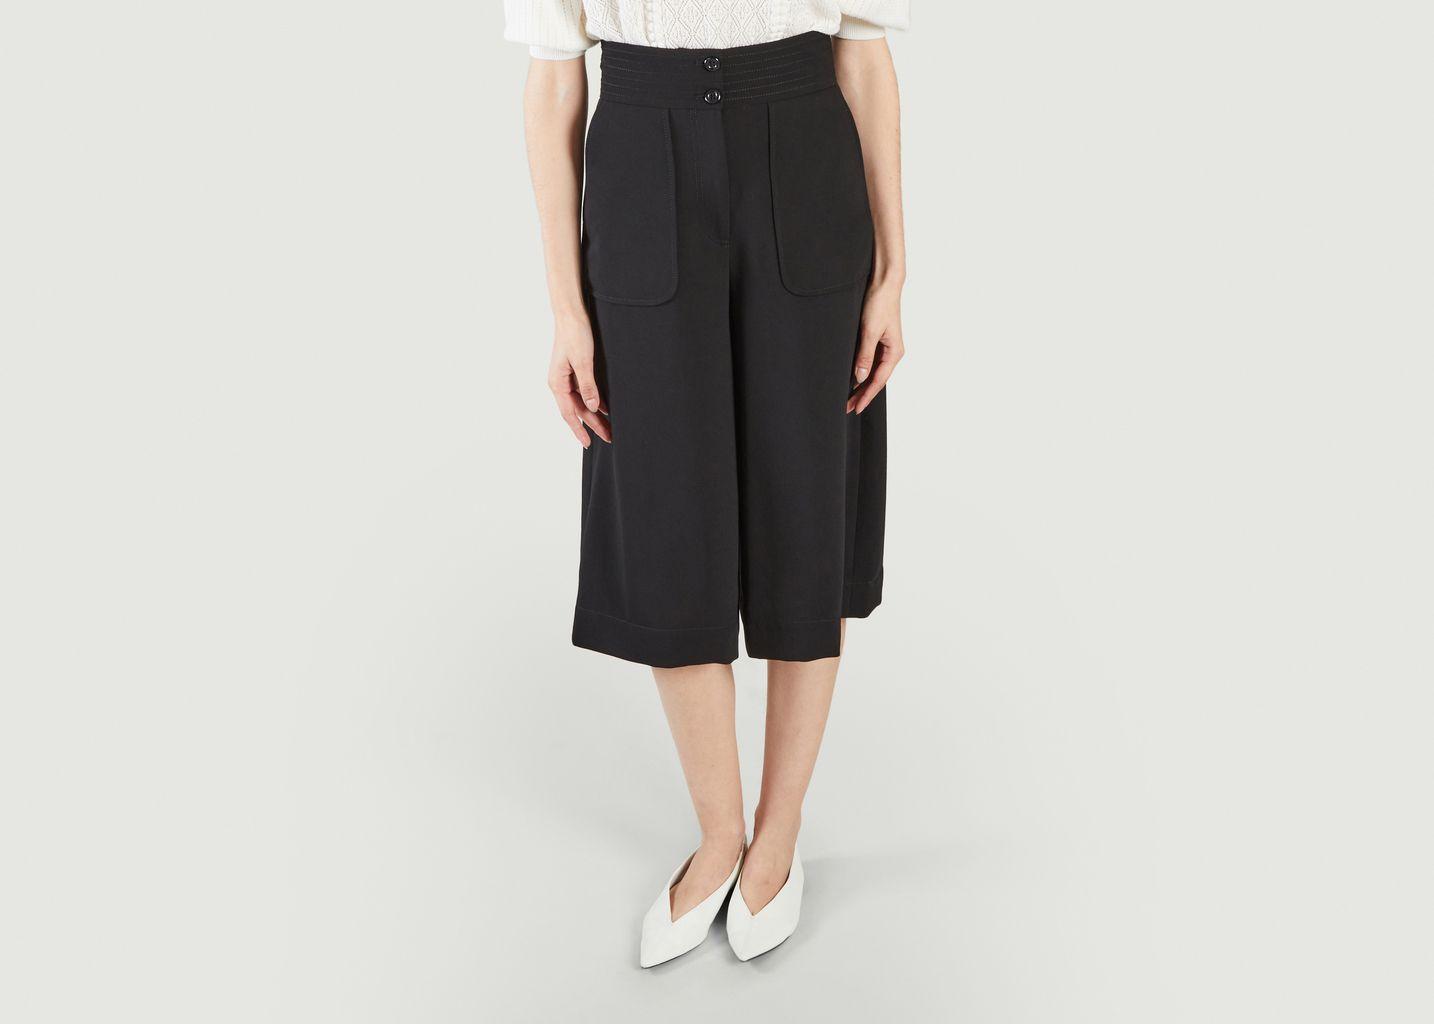 Pantalon jupe-culotte  - See by Chloé